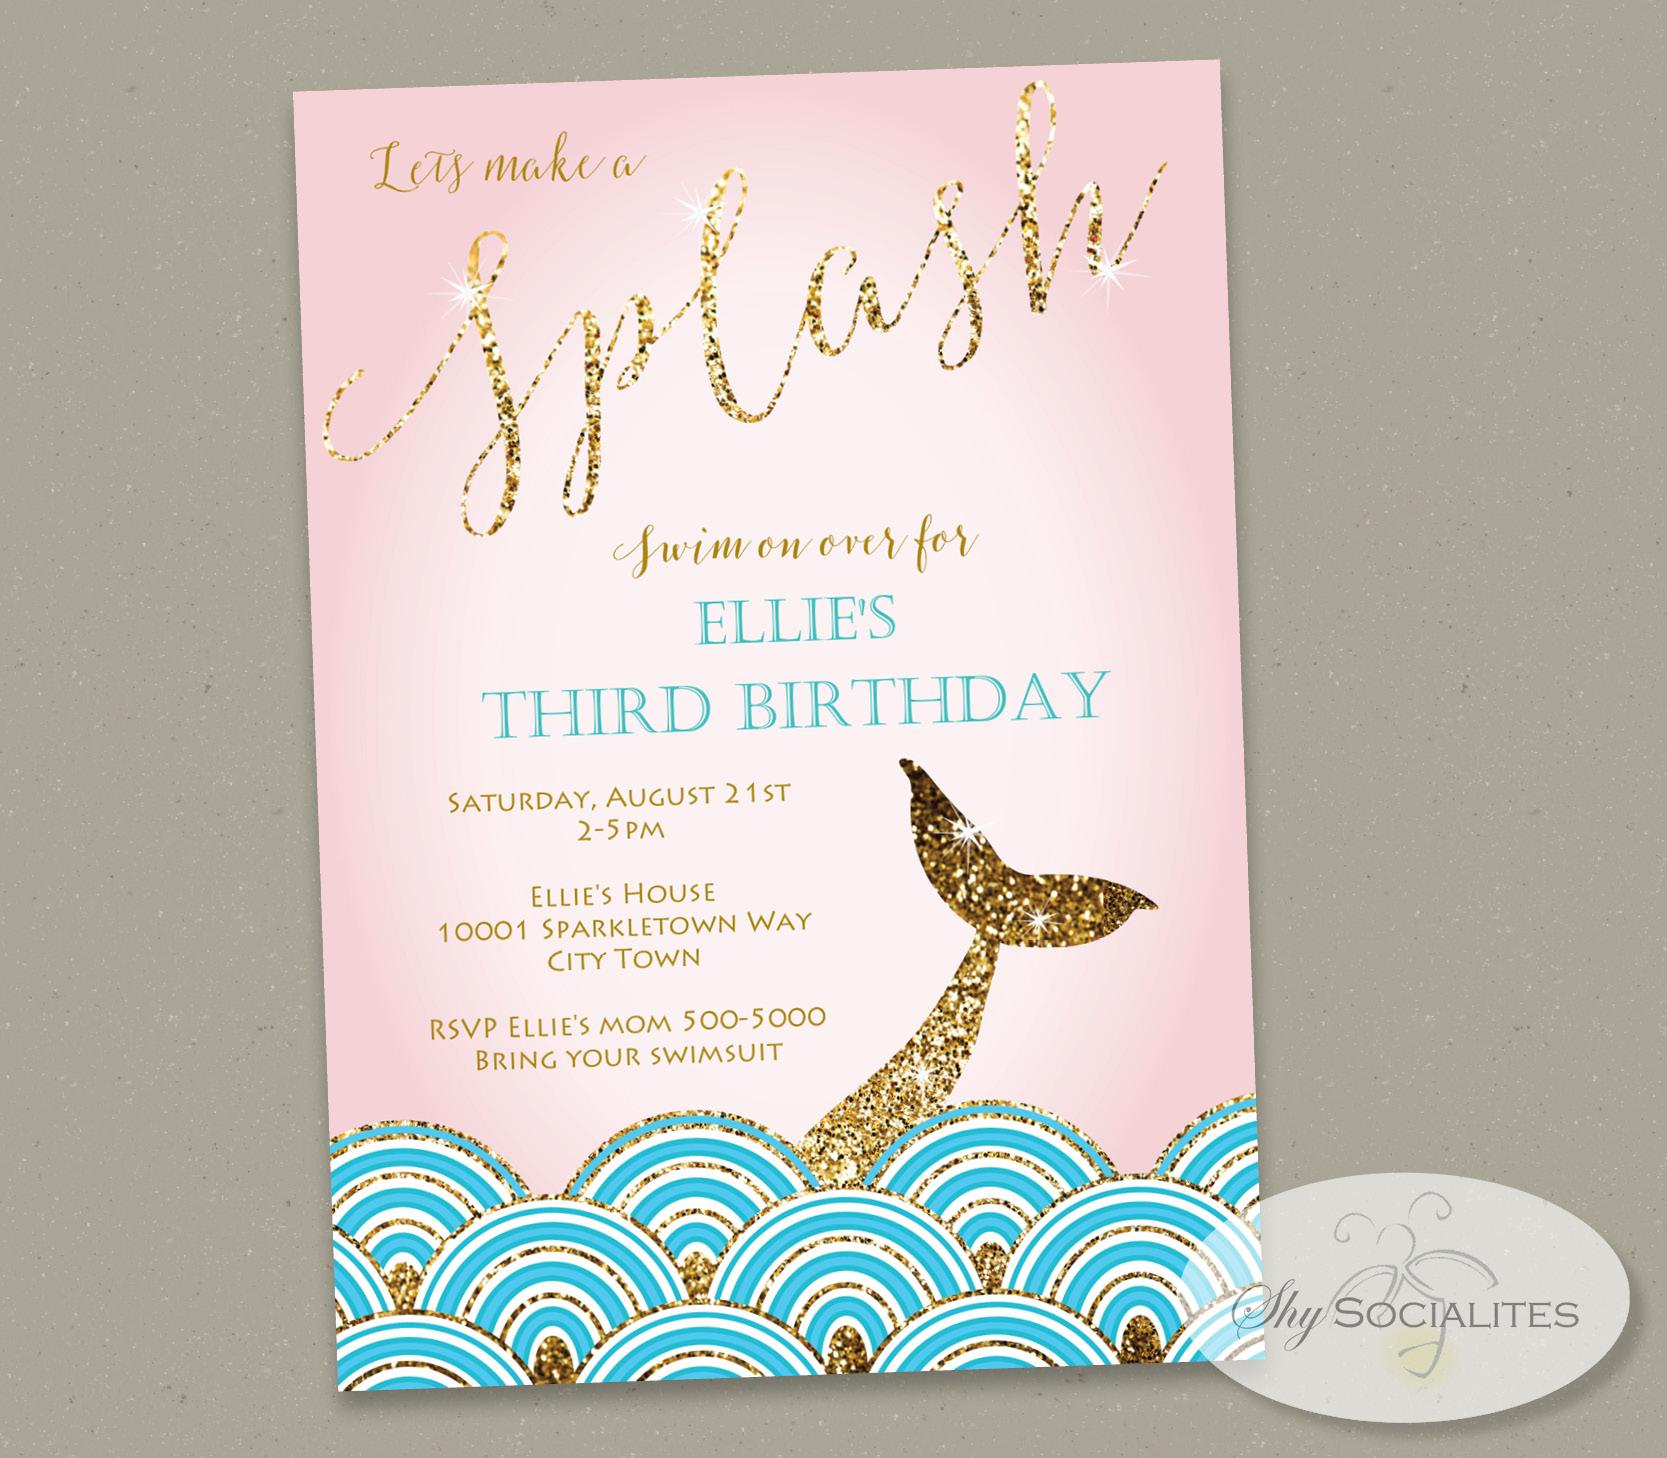 Gold Glitter Mermaid Tail Invitation Shy Socialites